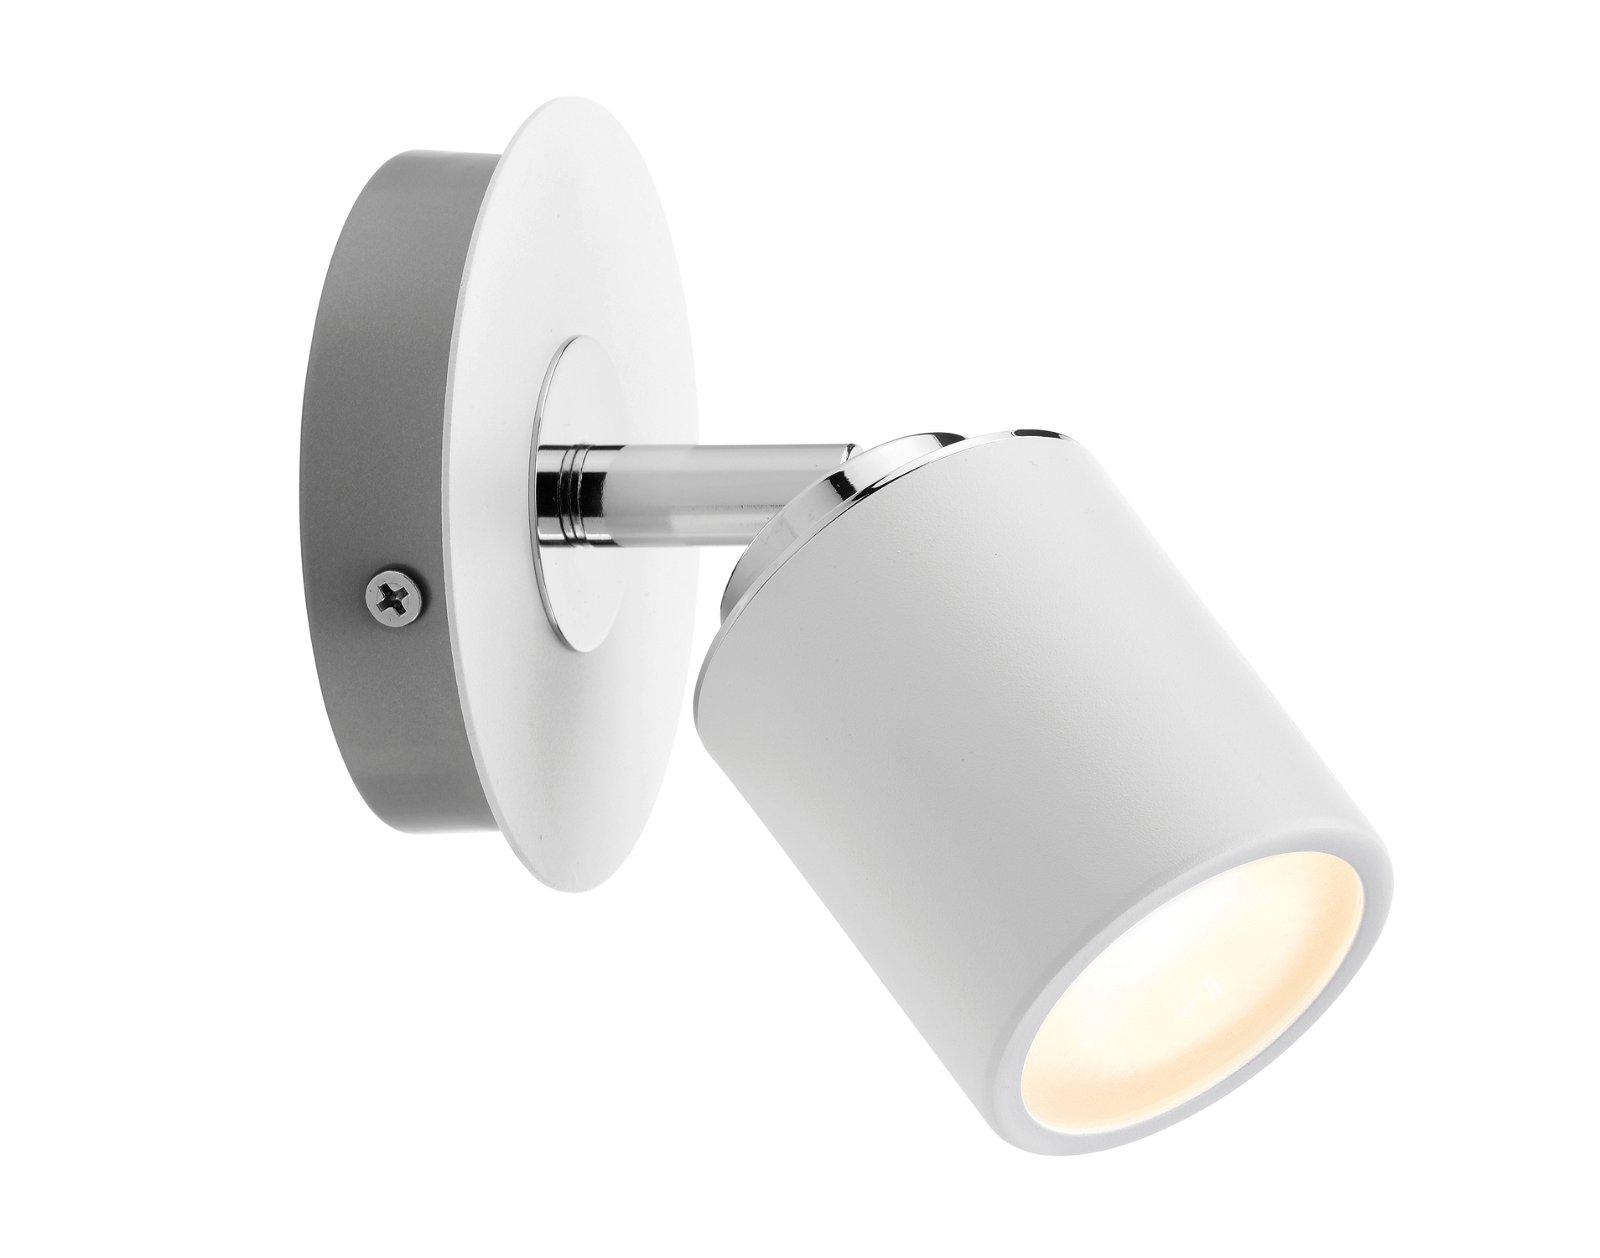 Spot de plafond Tube IP44 GU10 230V max. 10W Blanc/Chrome